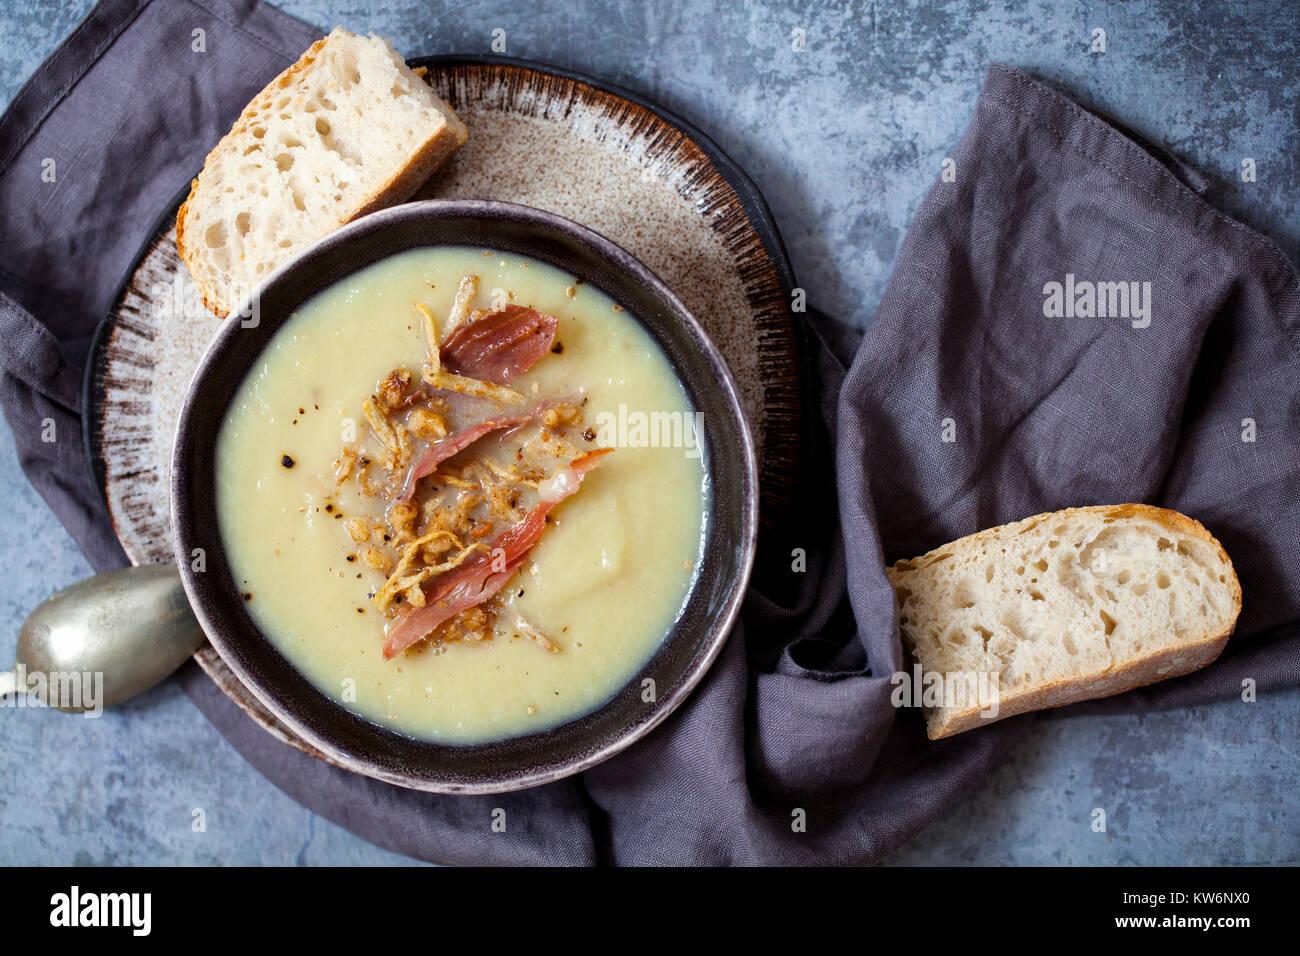 Jerusalem artichoke soup with walnut, ginger and parma ham crumb - Stock Image